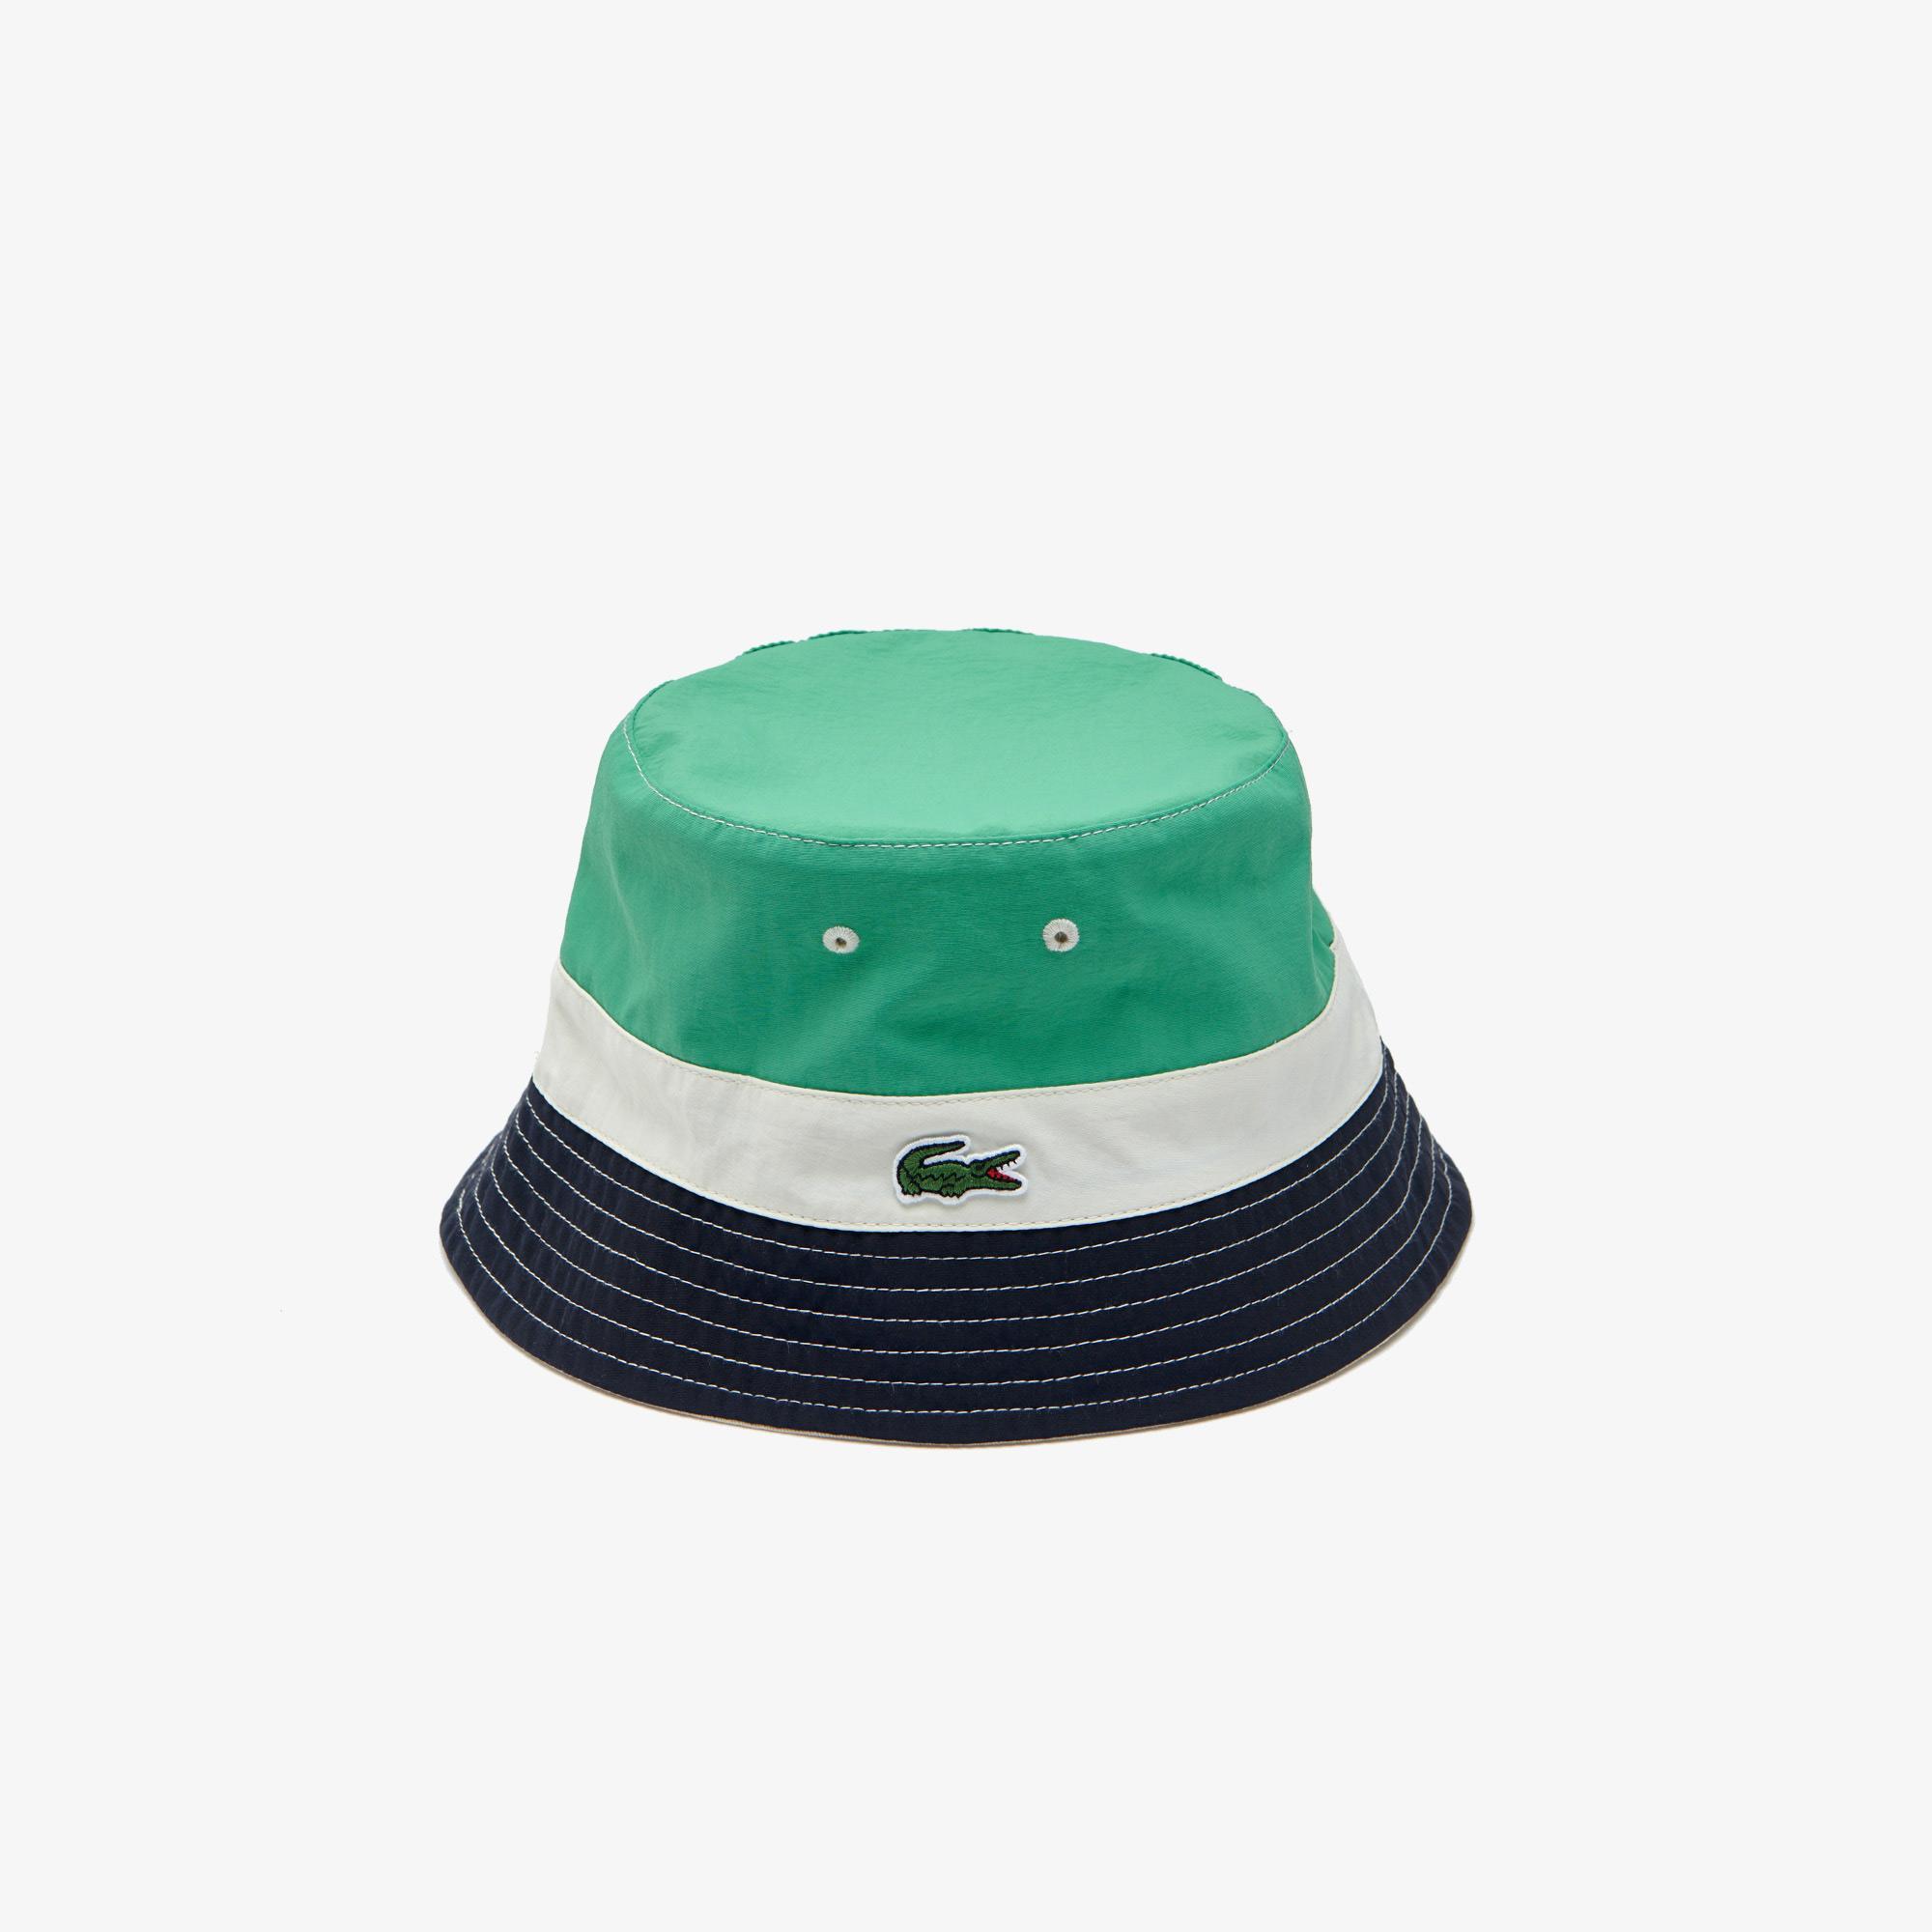 Lacoste Erkek Renk Bloklu Renkli Çift Taraflı Şapka